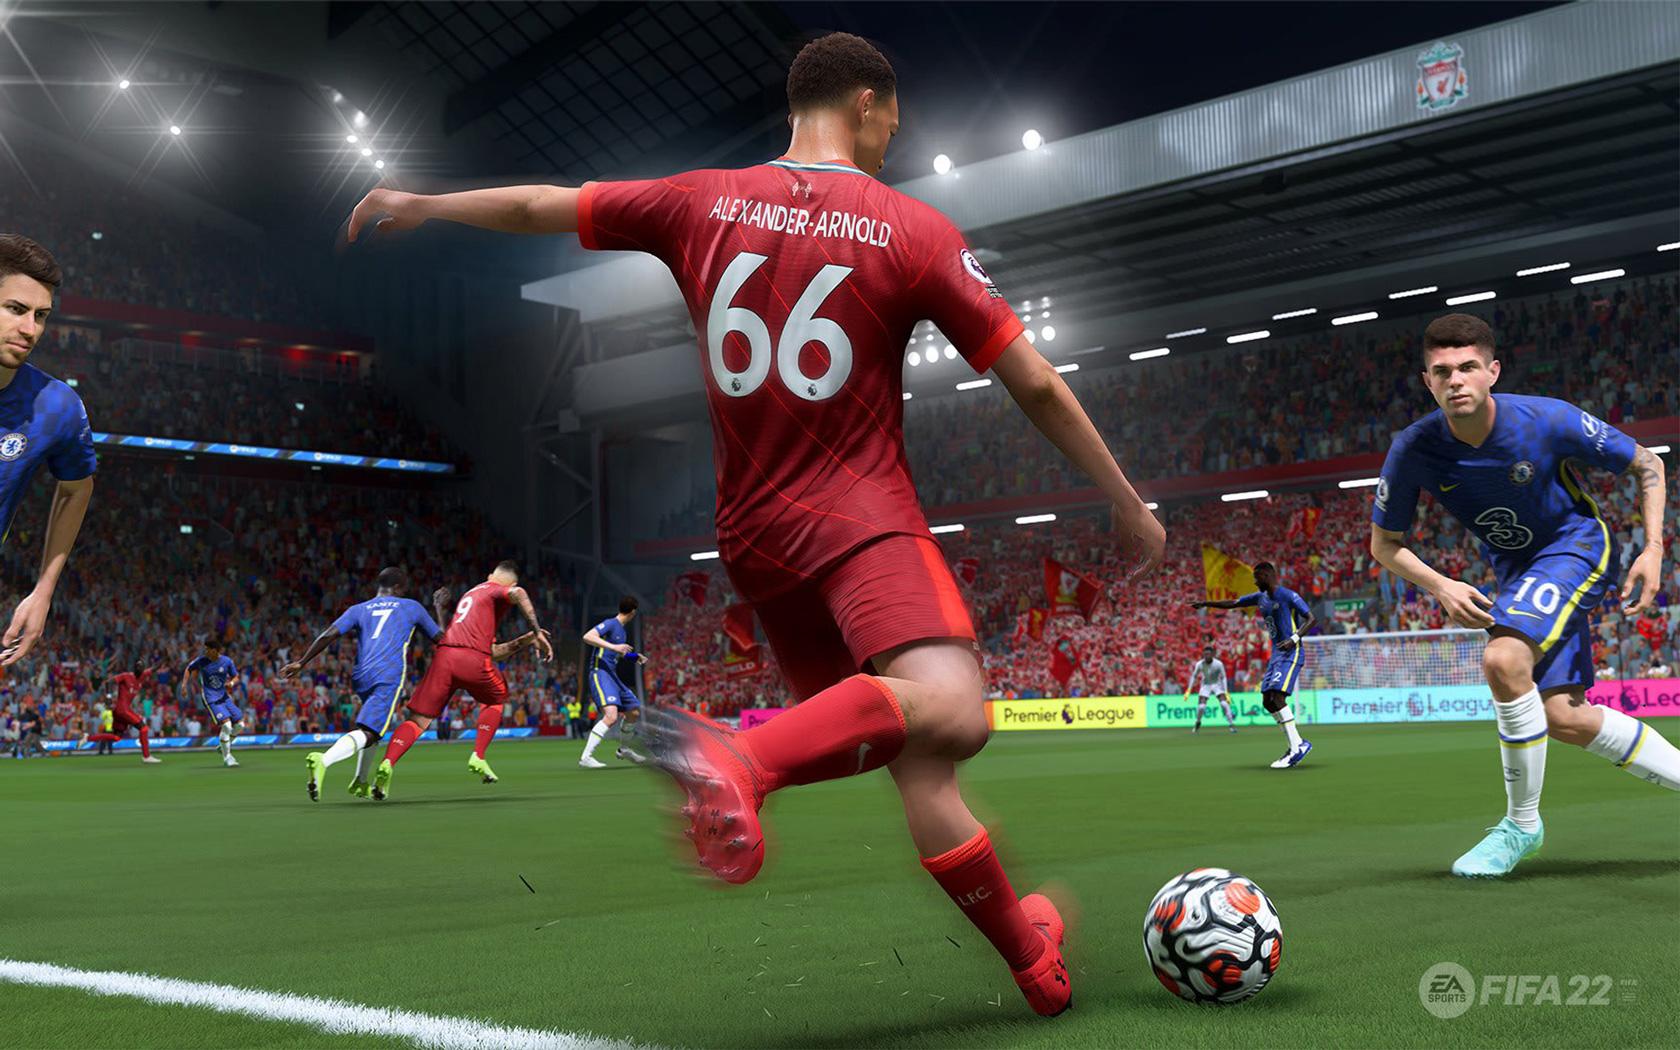 Free FIFA 22 Wallpaper in 1680x1050